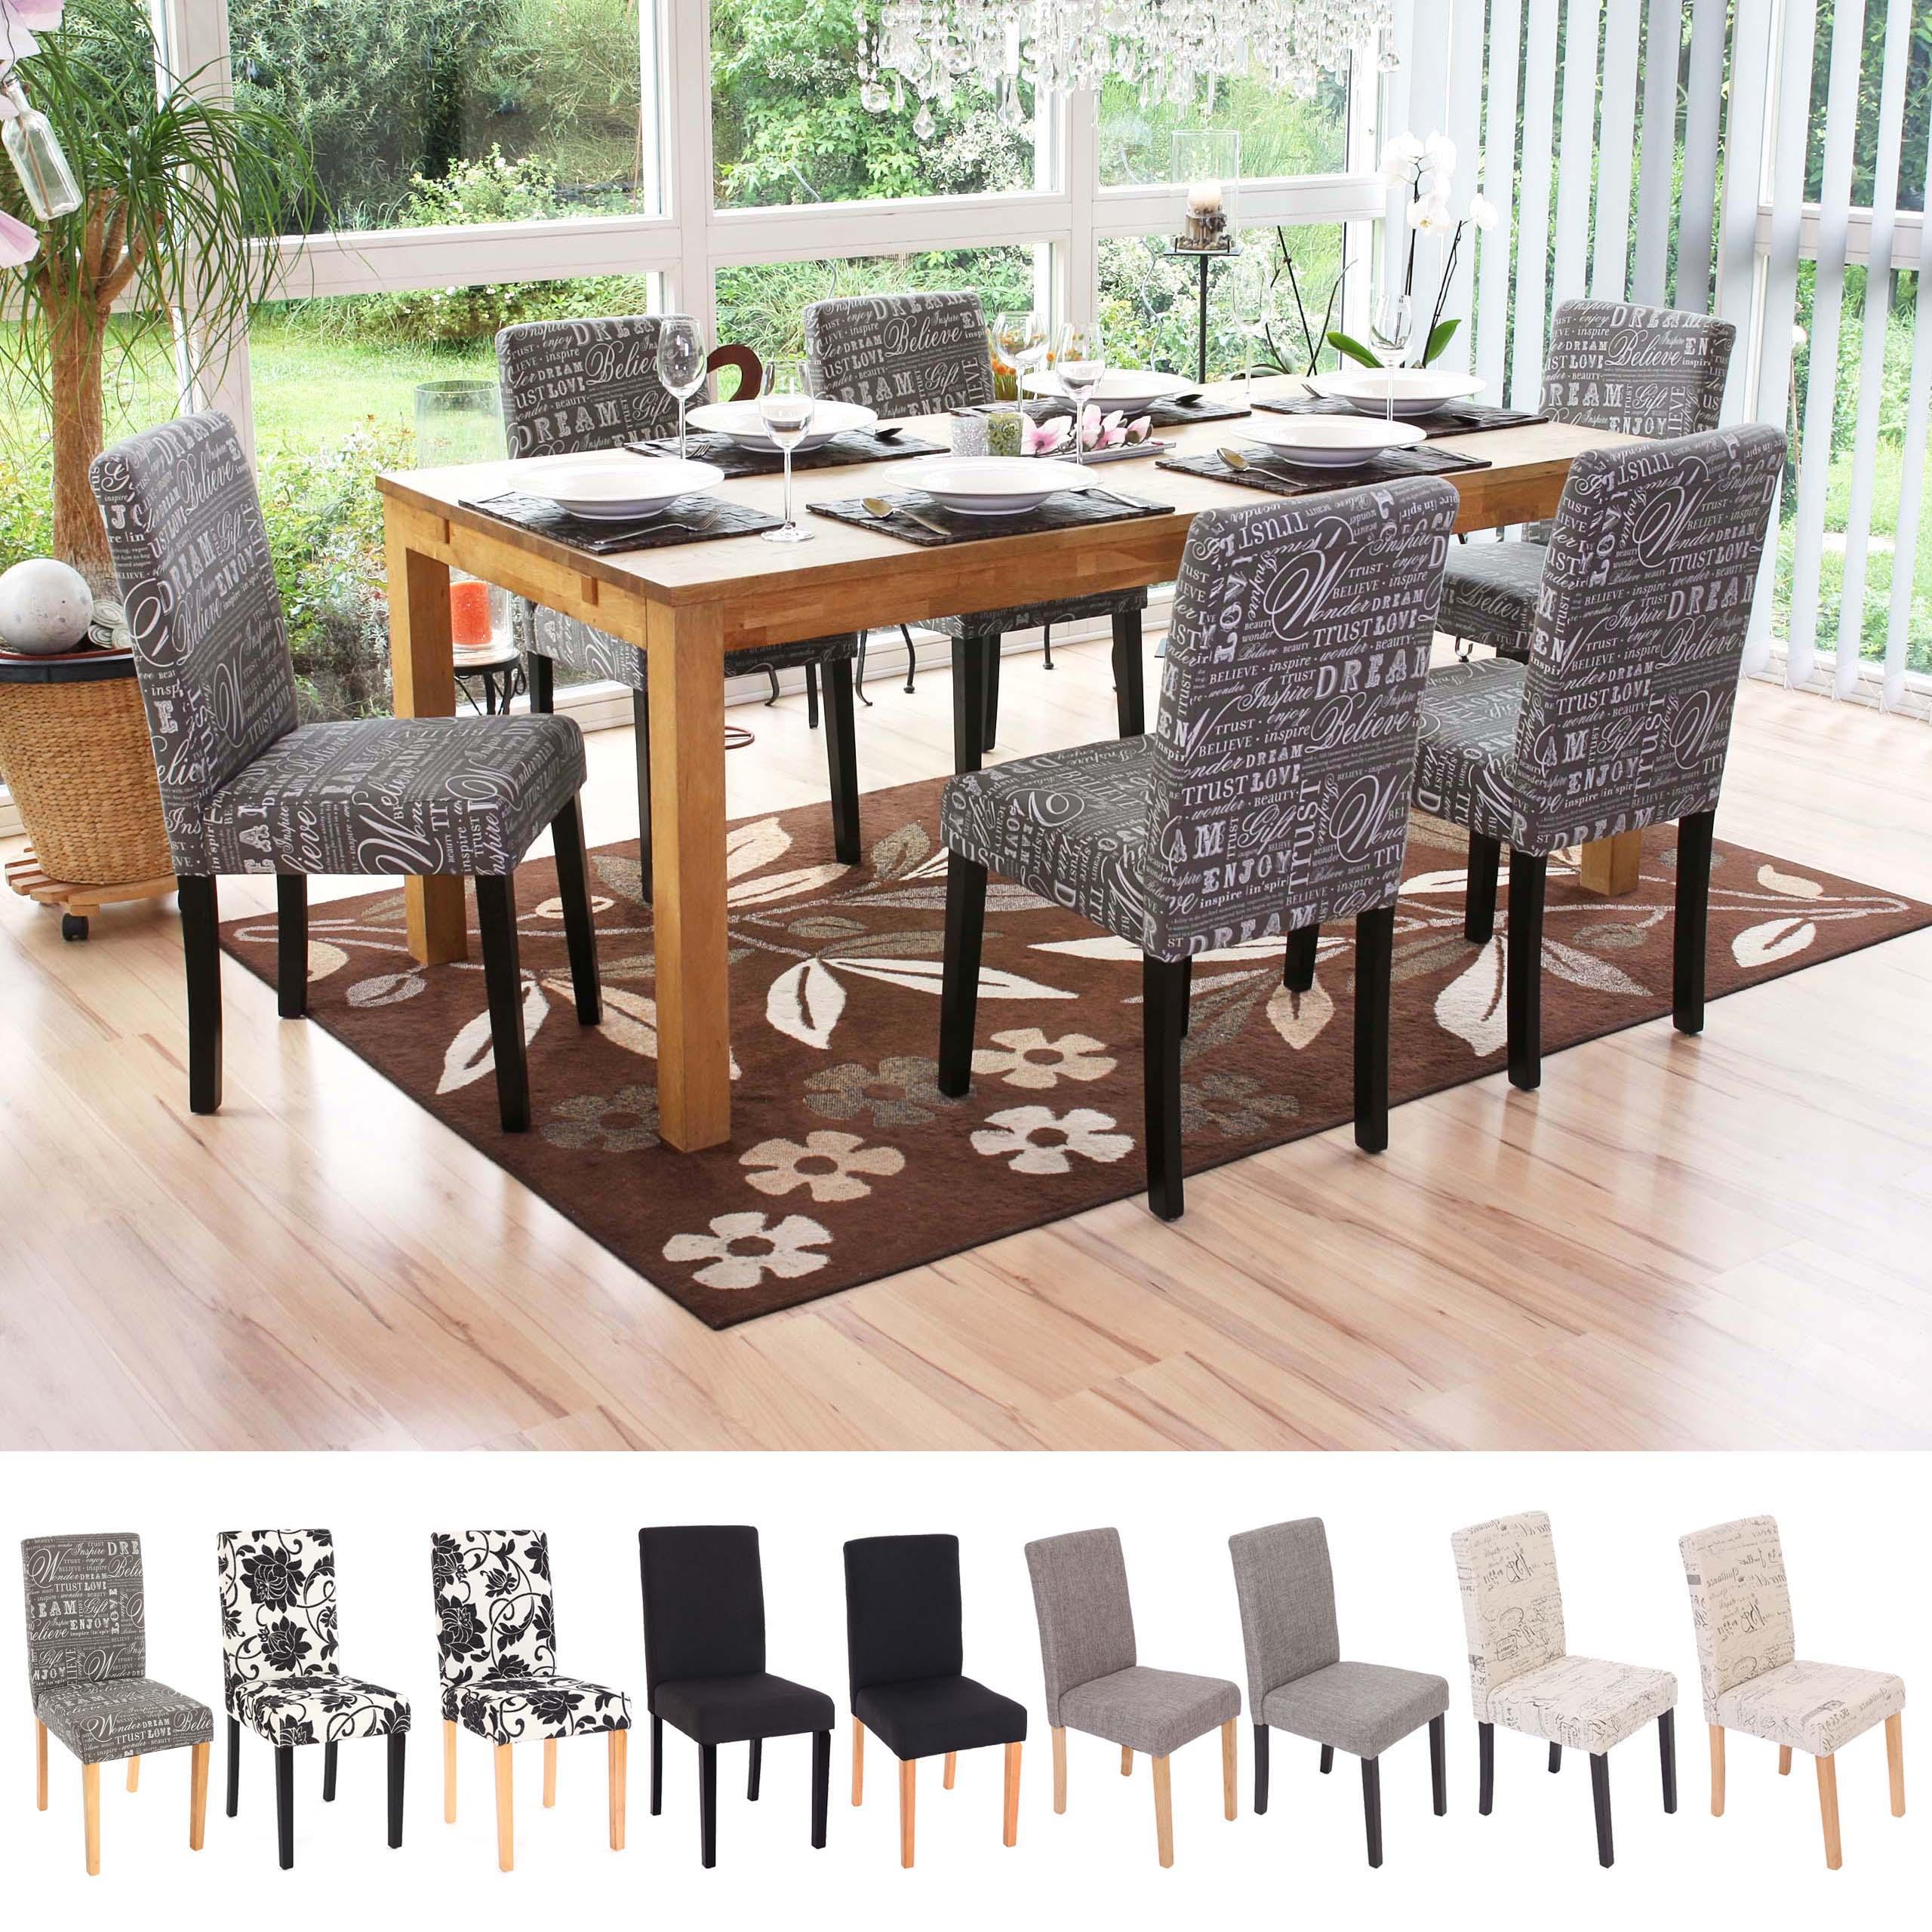 2x esszimmerstuhl stuhl lehnstuhl littau textil uni jacquard schriftzug ebay. Black Bedroom Furniture Sets. Home Design Ideas